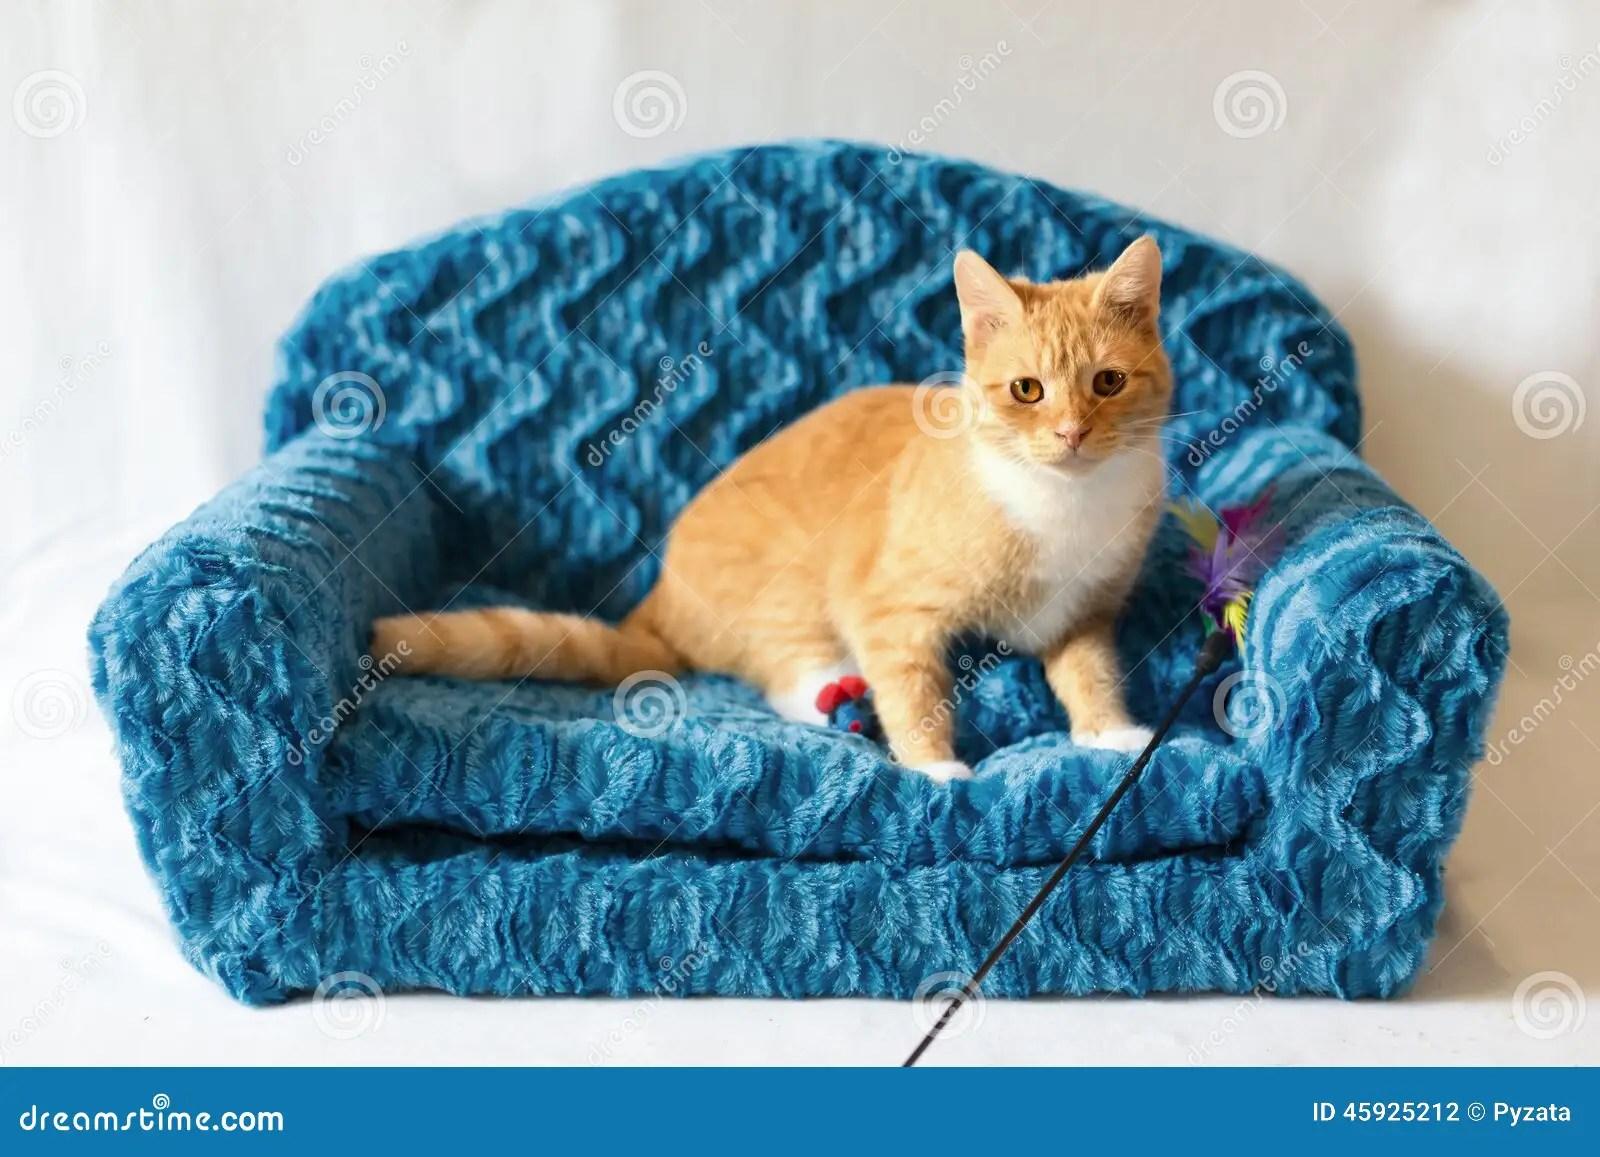 cat tunnel sofa price velvet tufted sleeper couch kitty stock photo image 45925212